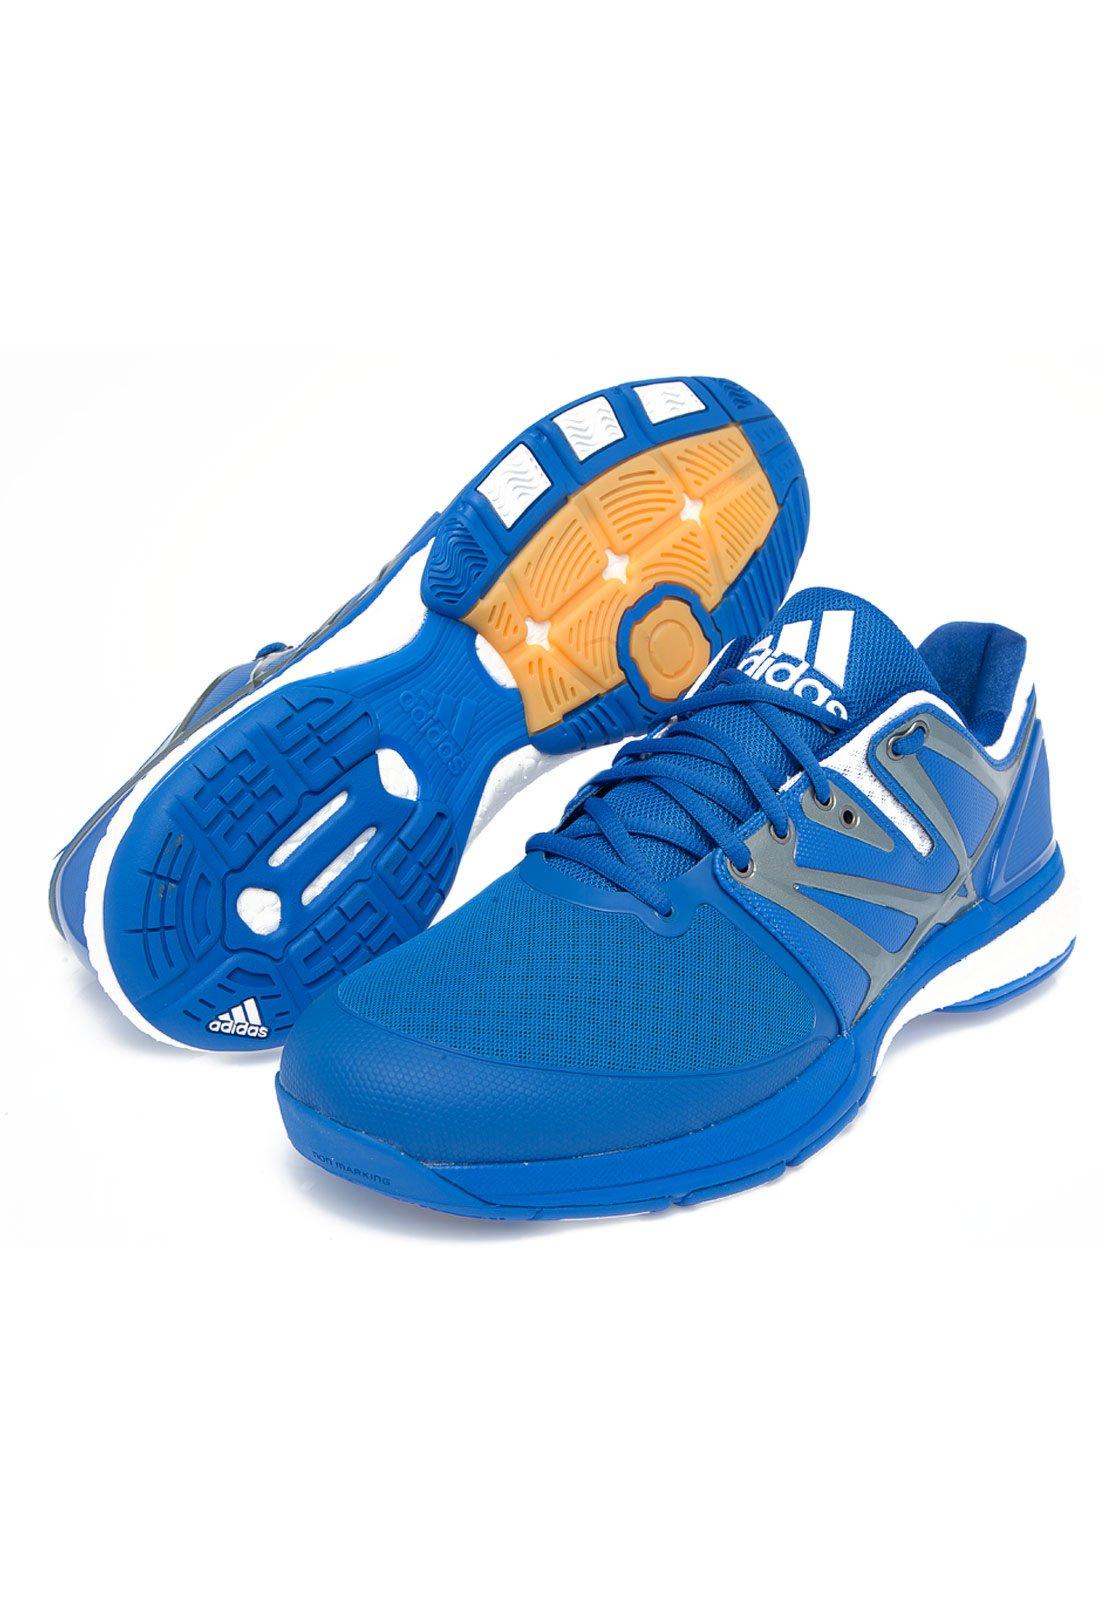 tenis adidas azul stabil 9e9c12ea5be